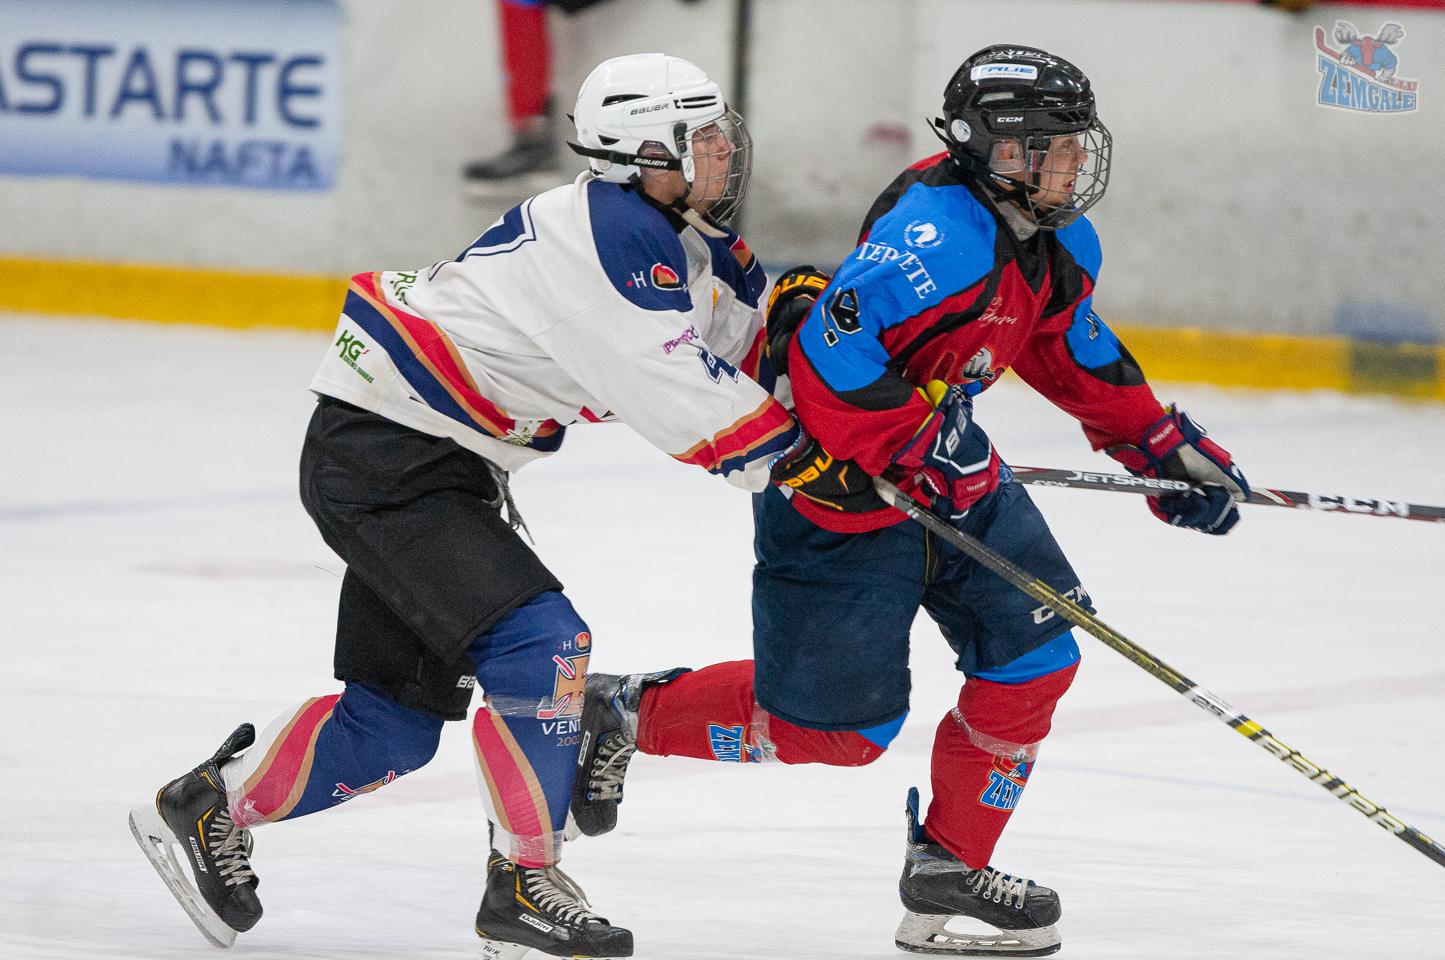 Jelgavas hokeja skola JLSS U17 - Venta 2002 14092019-02